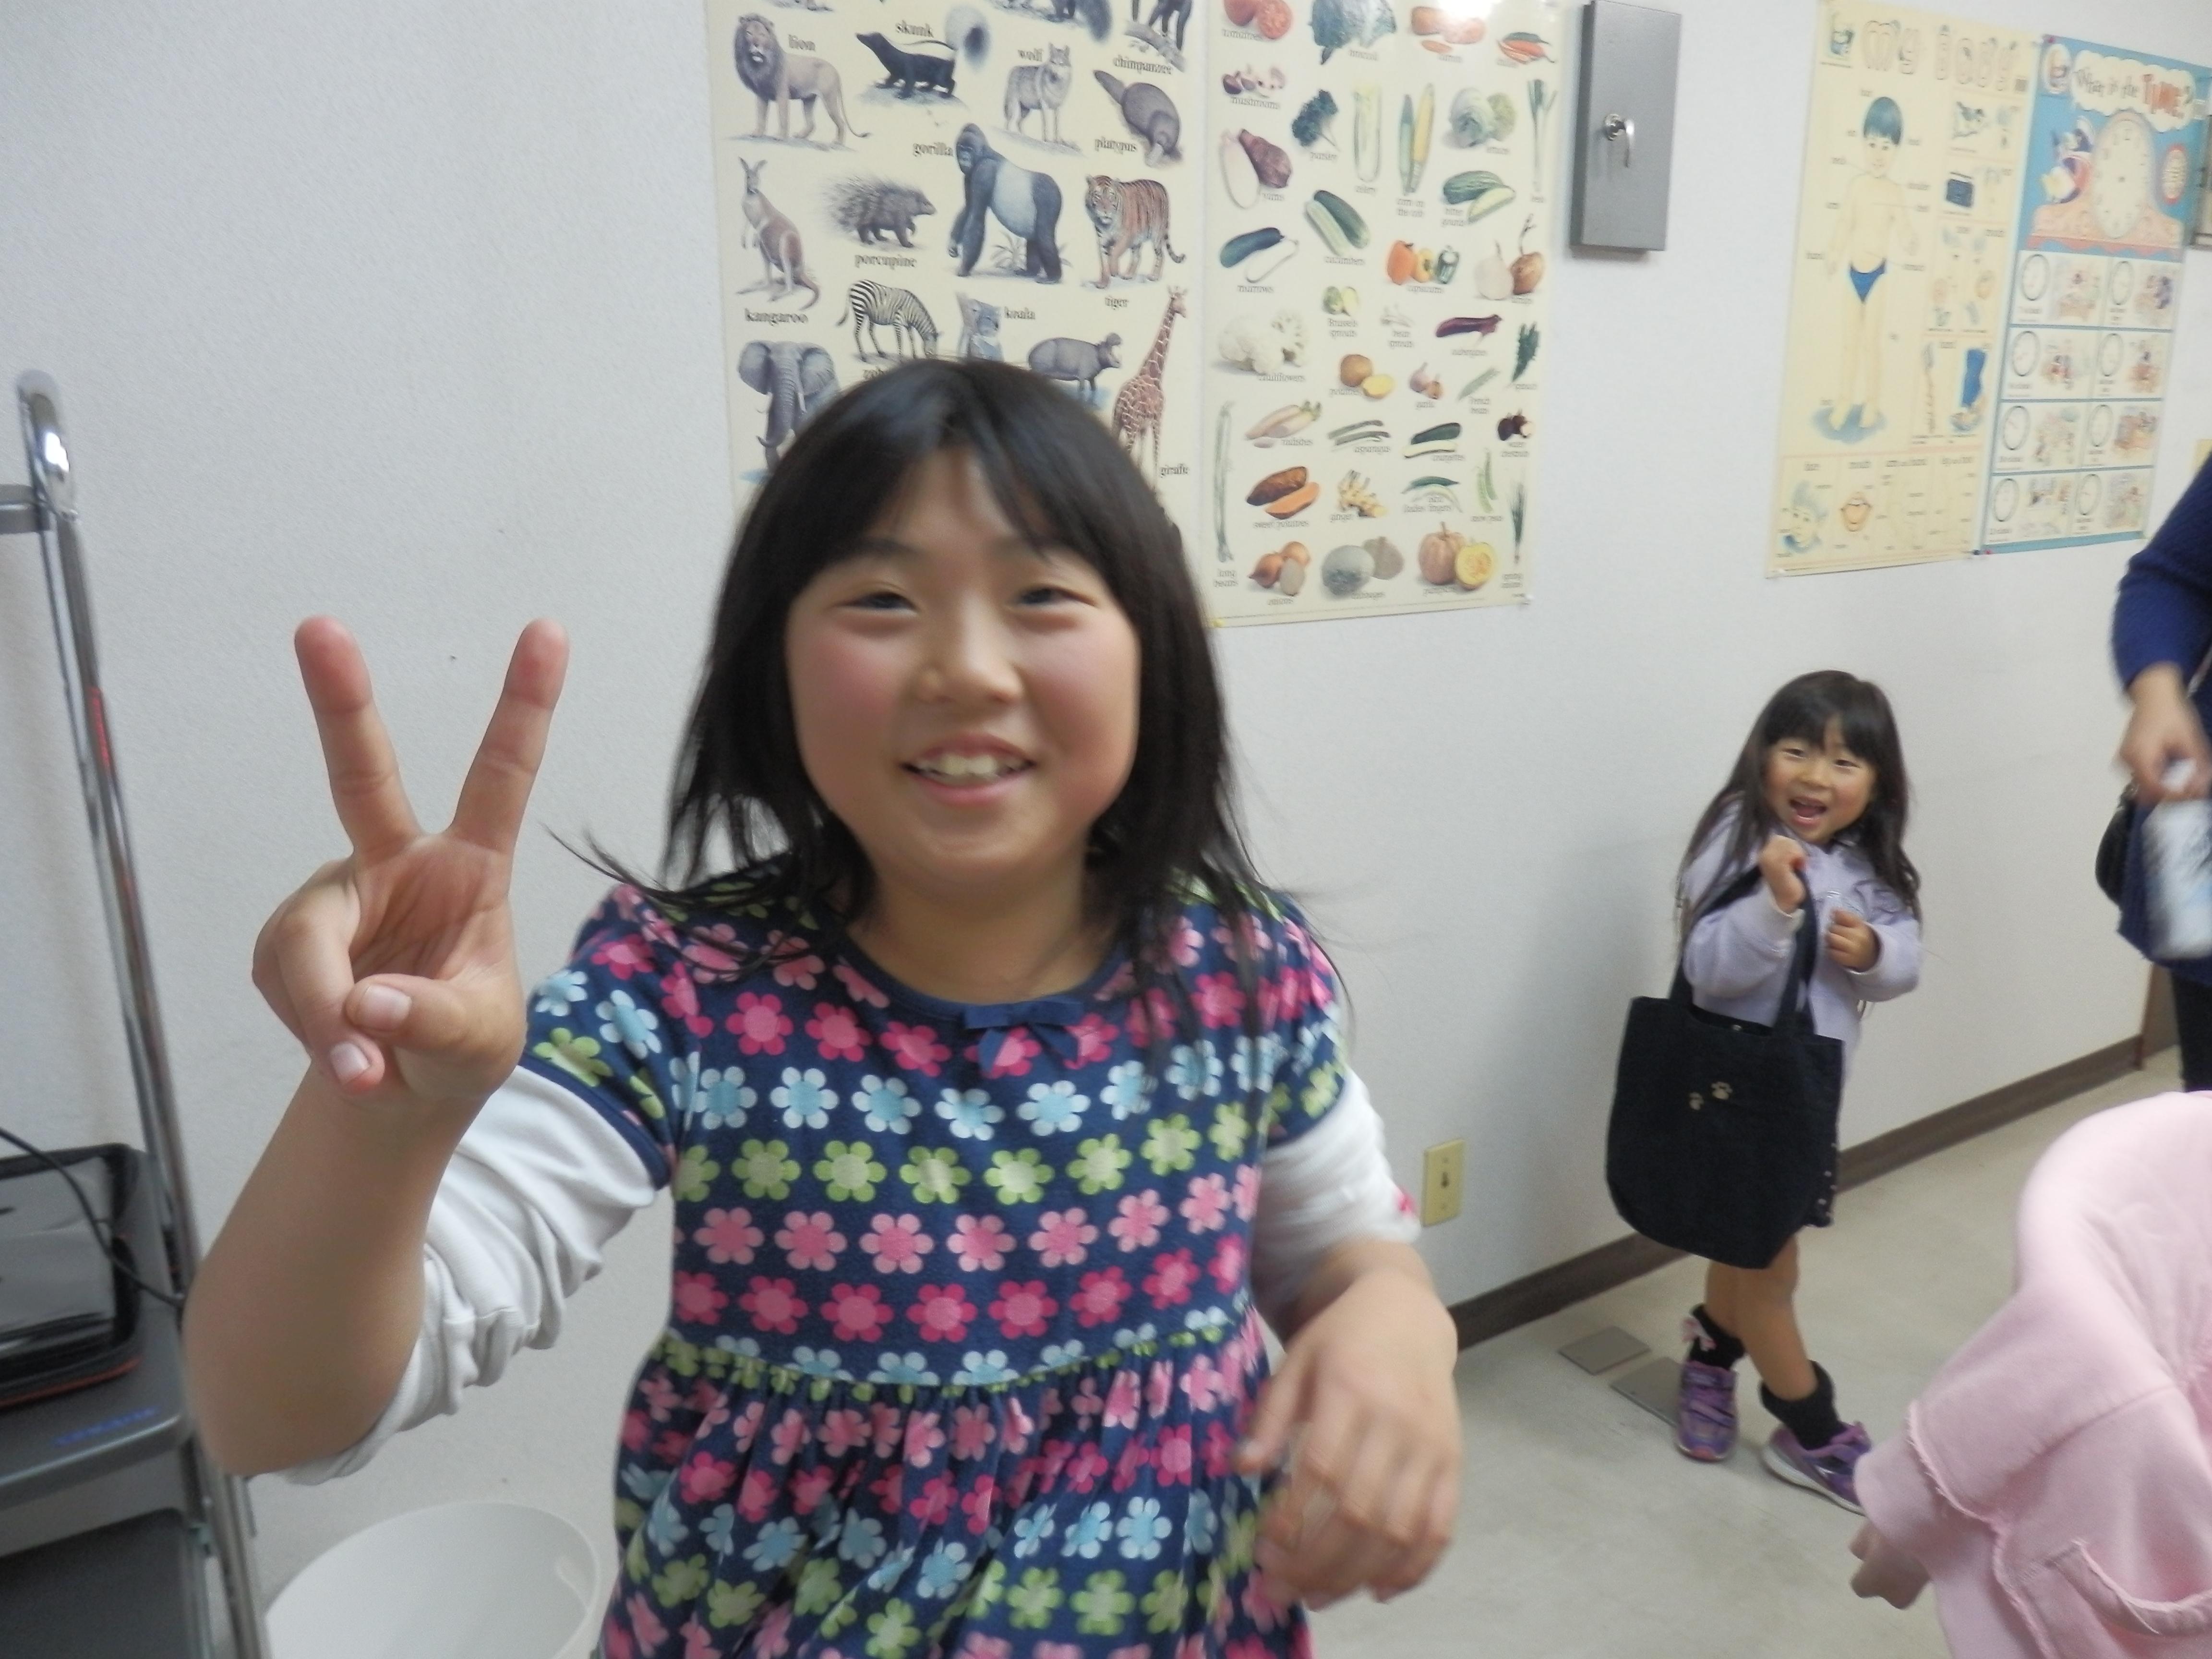 Jurina Funahashi